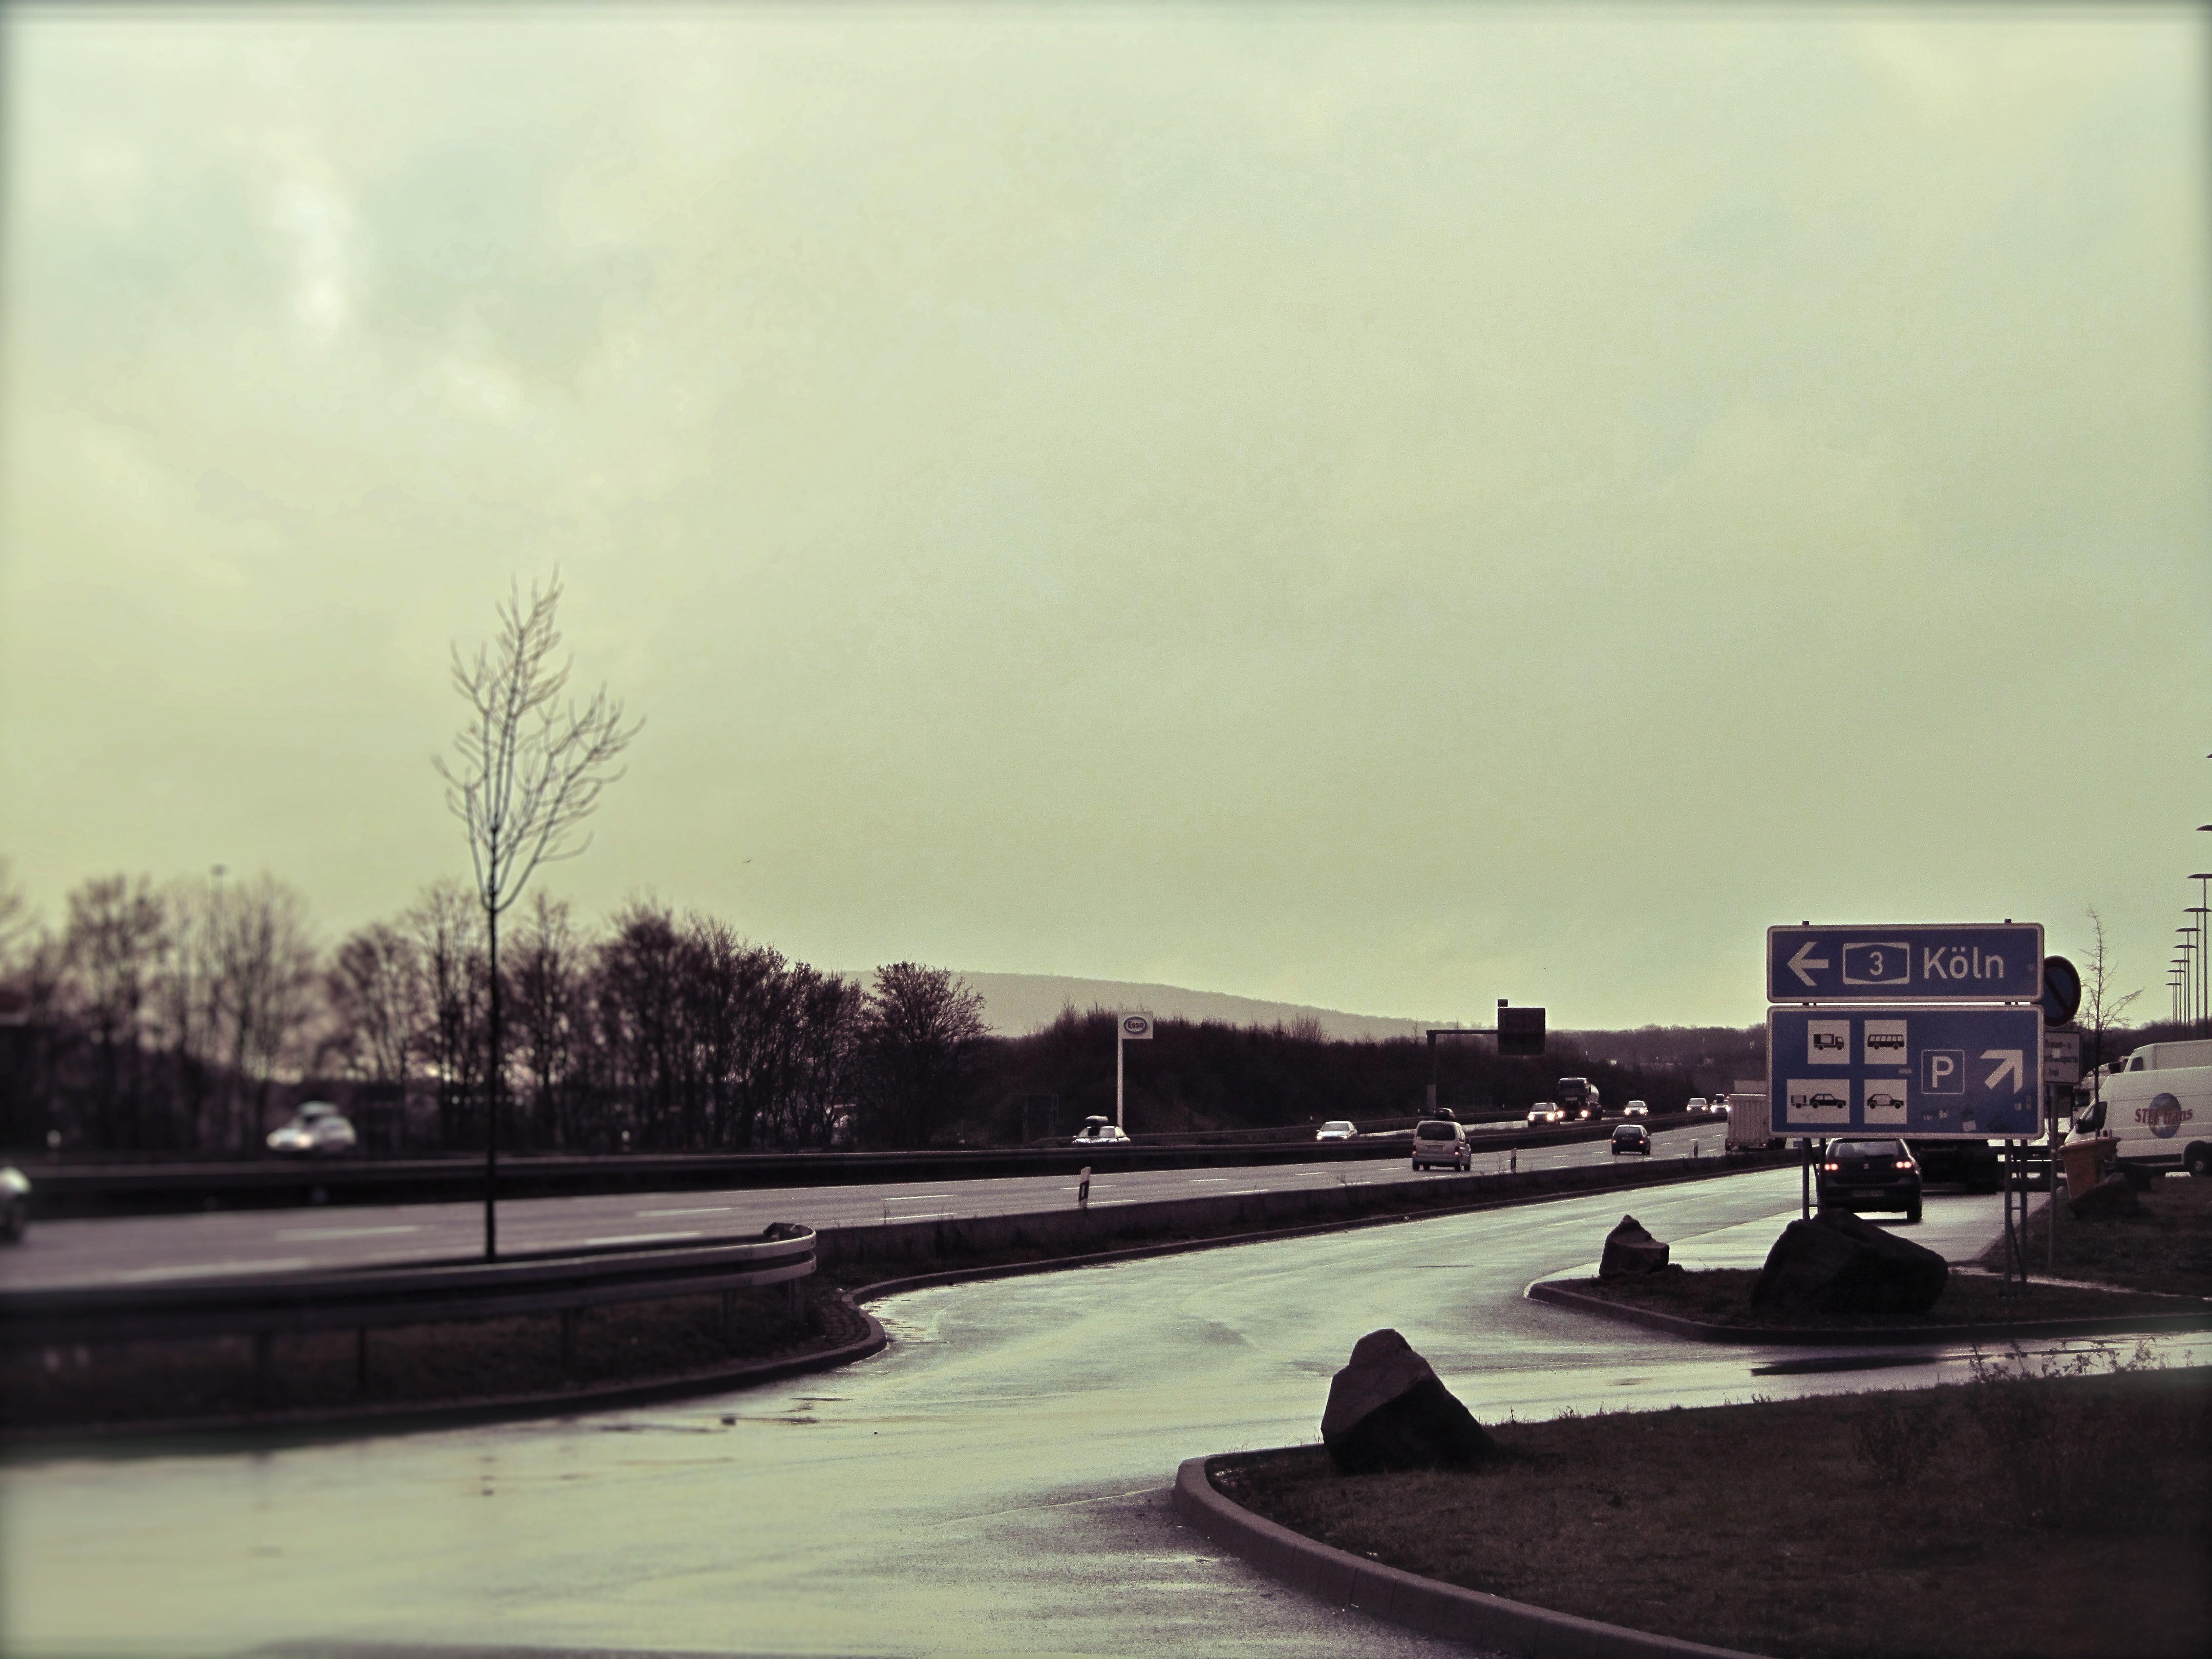 Koln, Christmas 2011. On the road to Amsterdam!